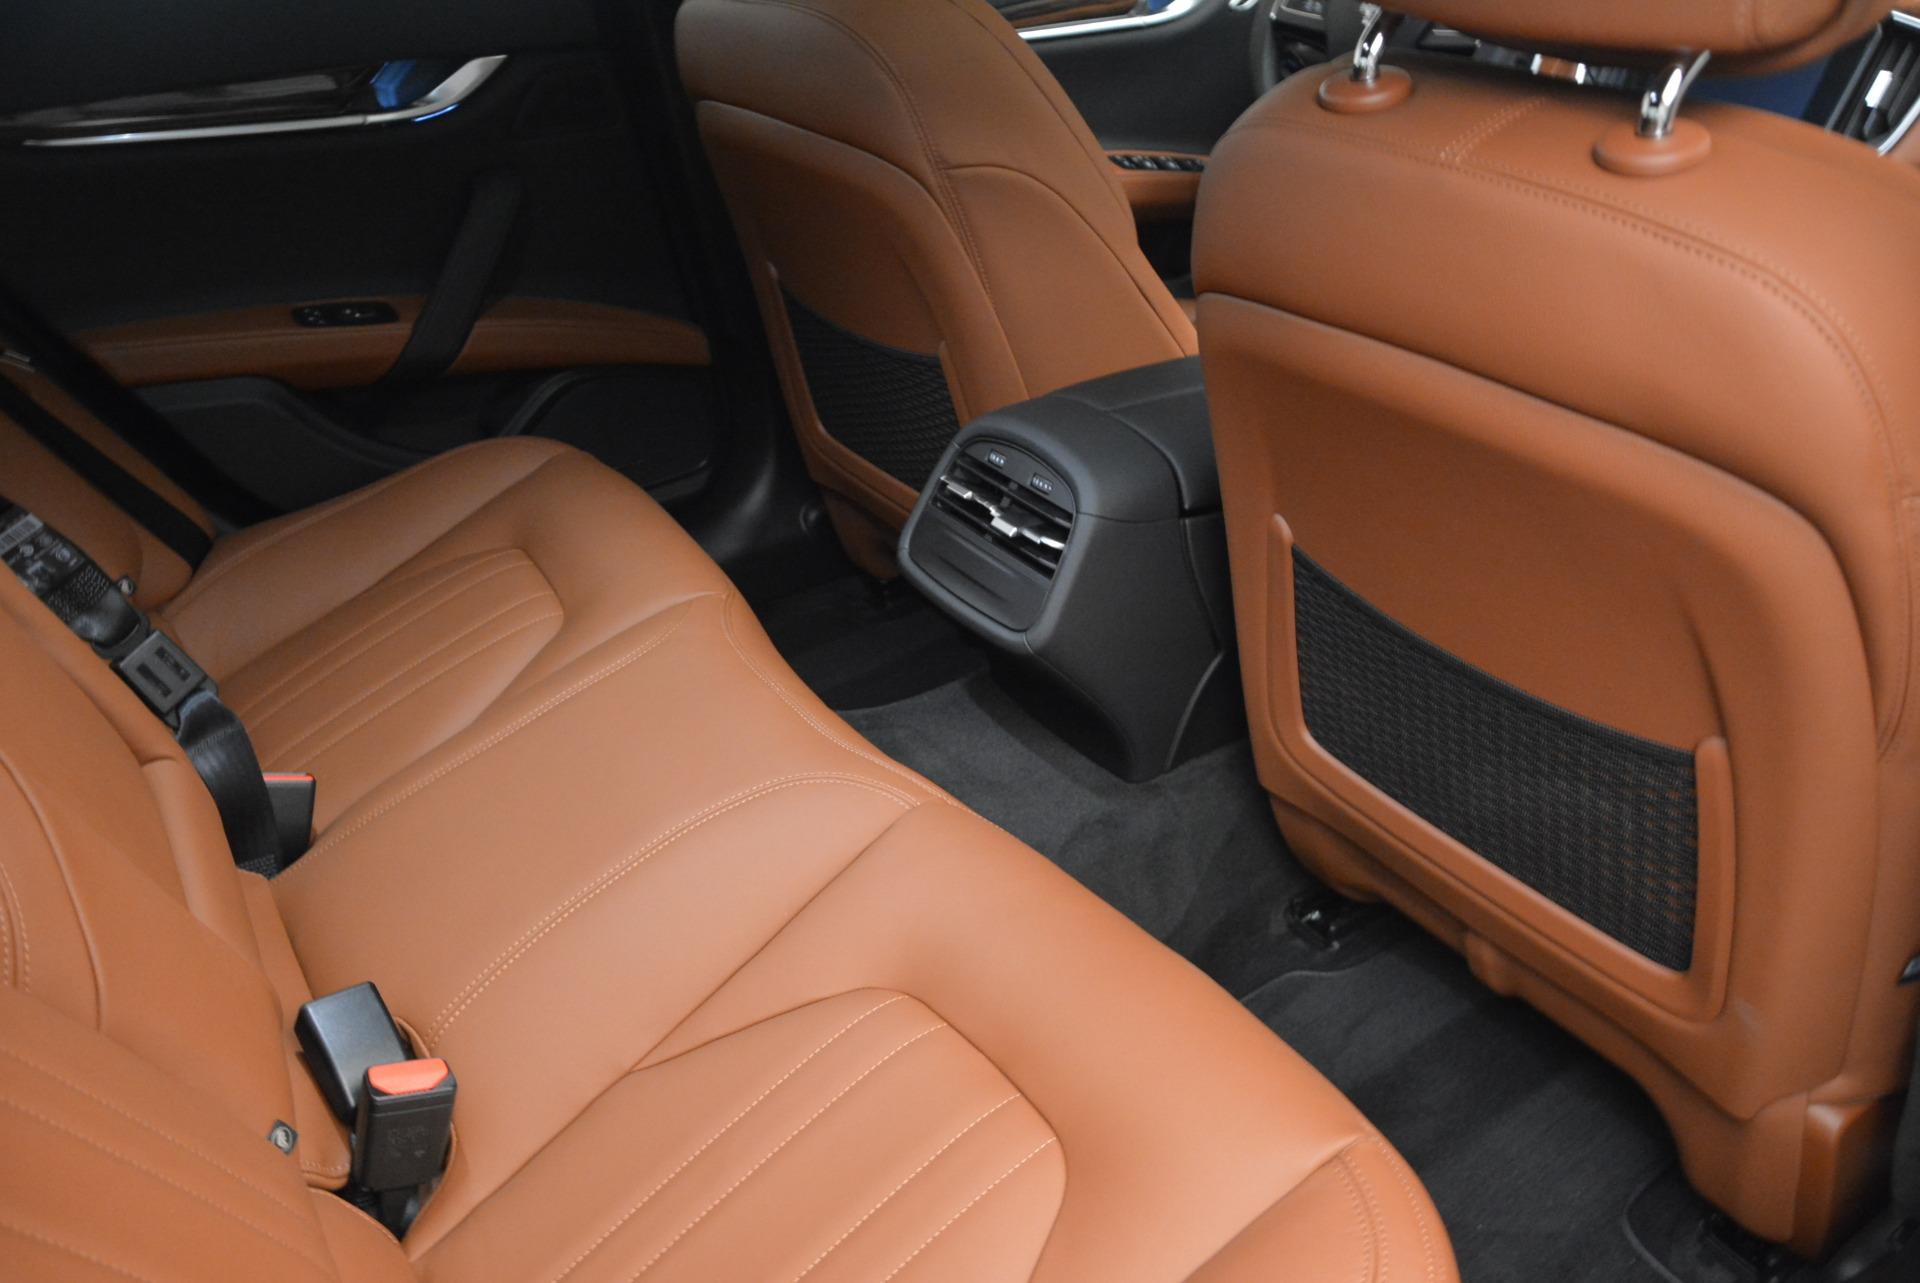 Used 2017 Maserati Ghibli S Q4 Ex-Loaner For Sale In Greenwich, CT 719_p23